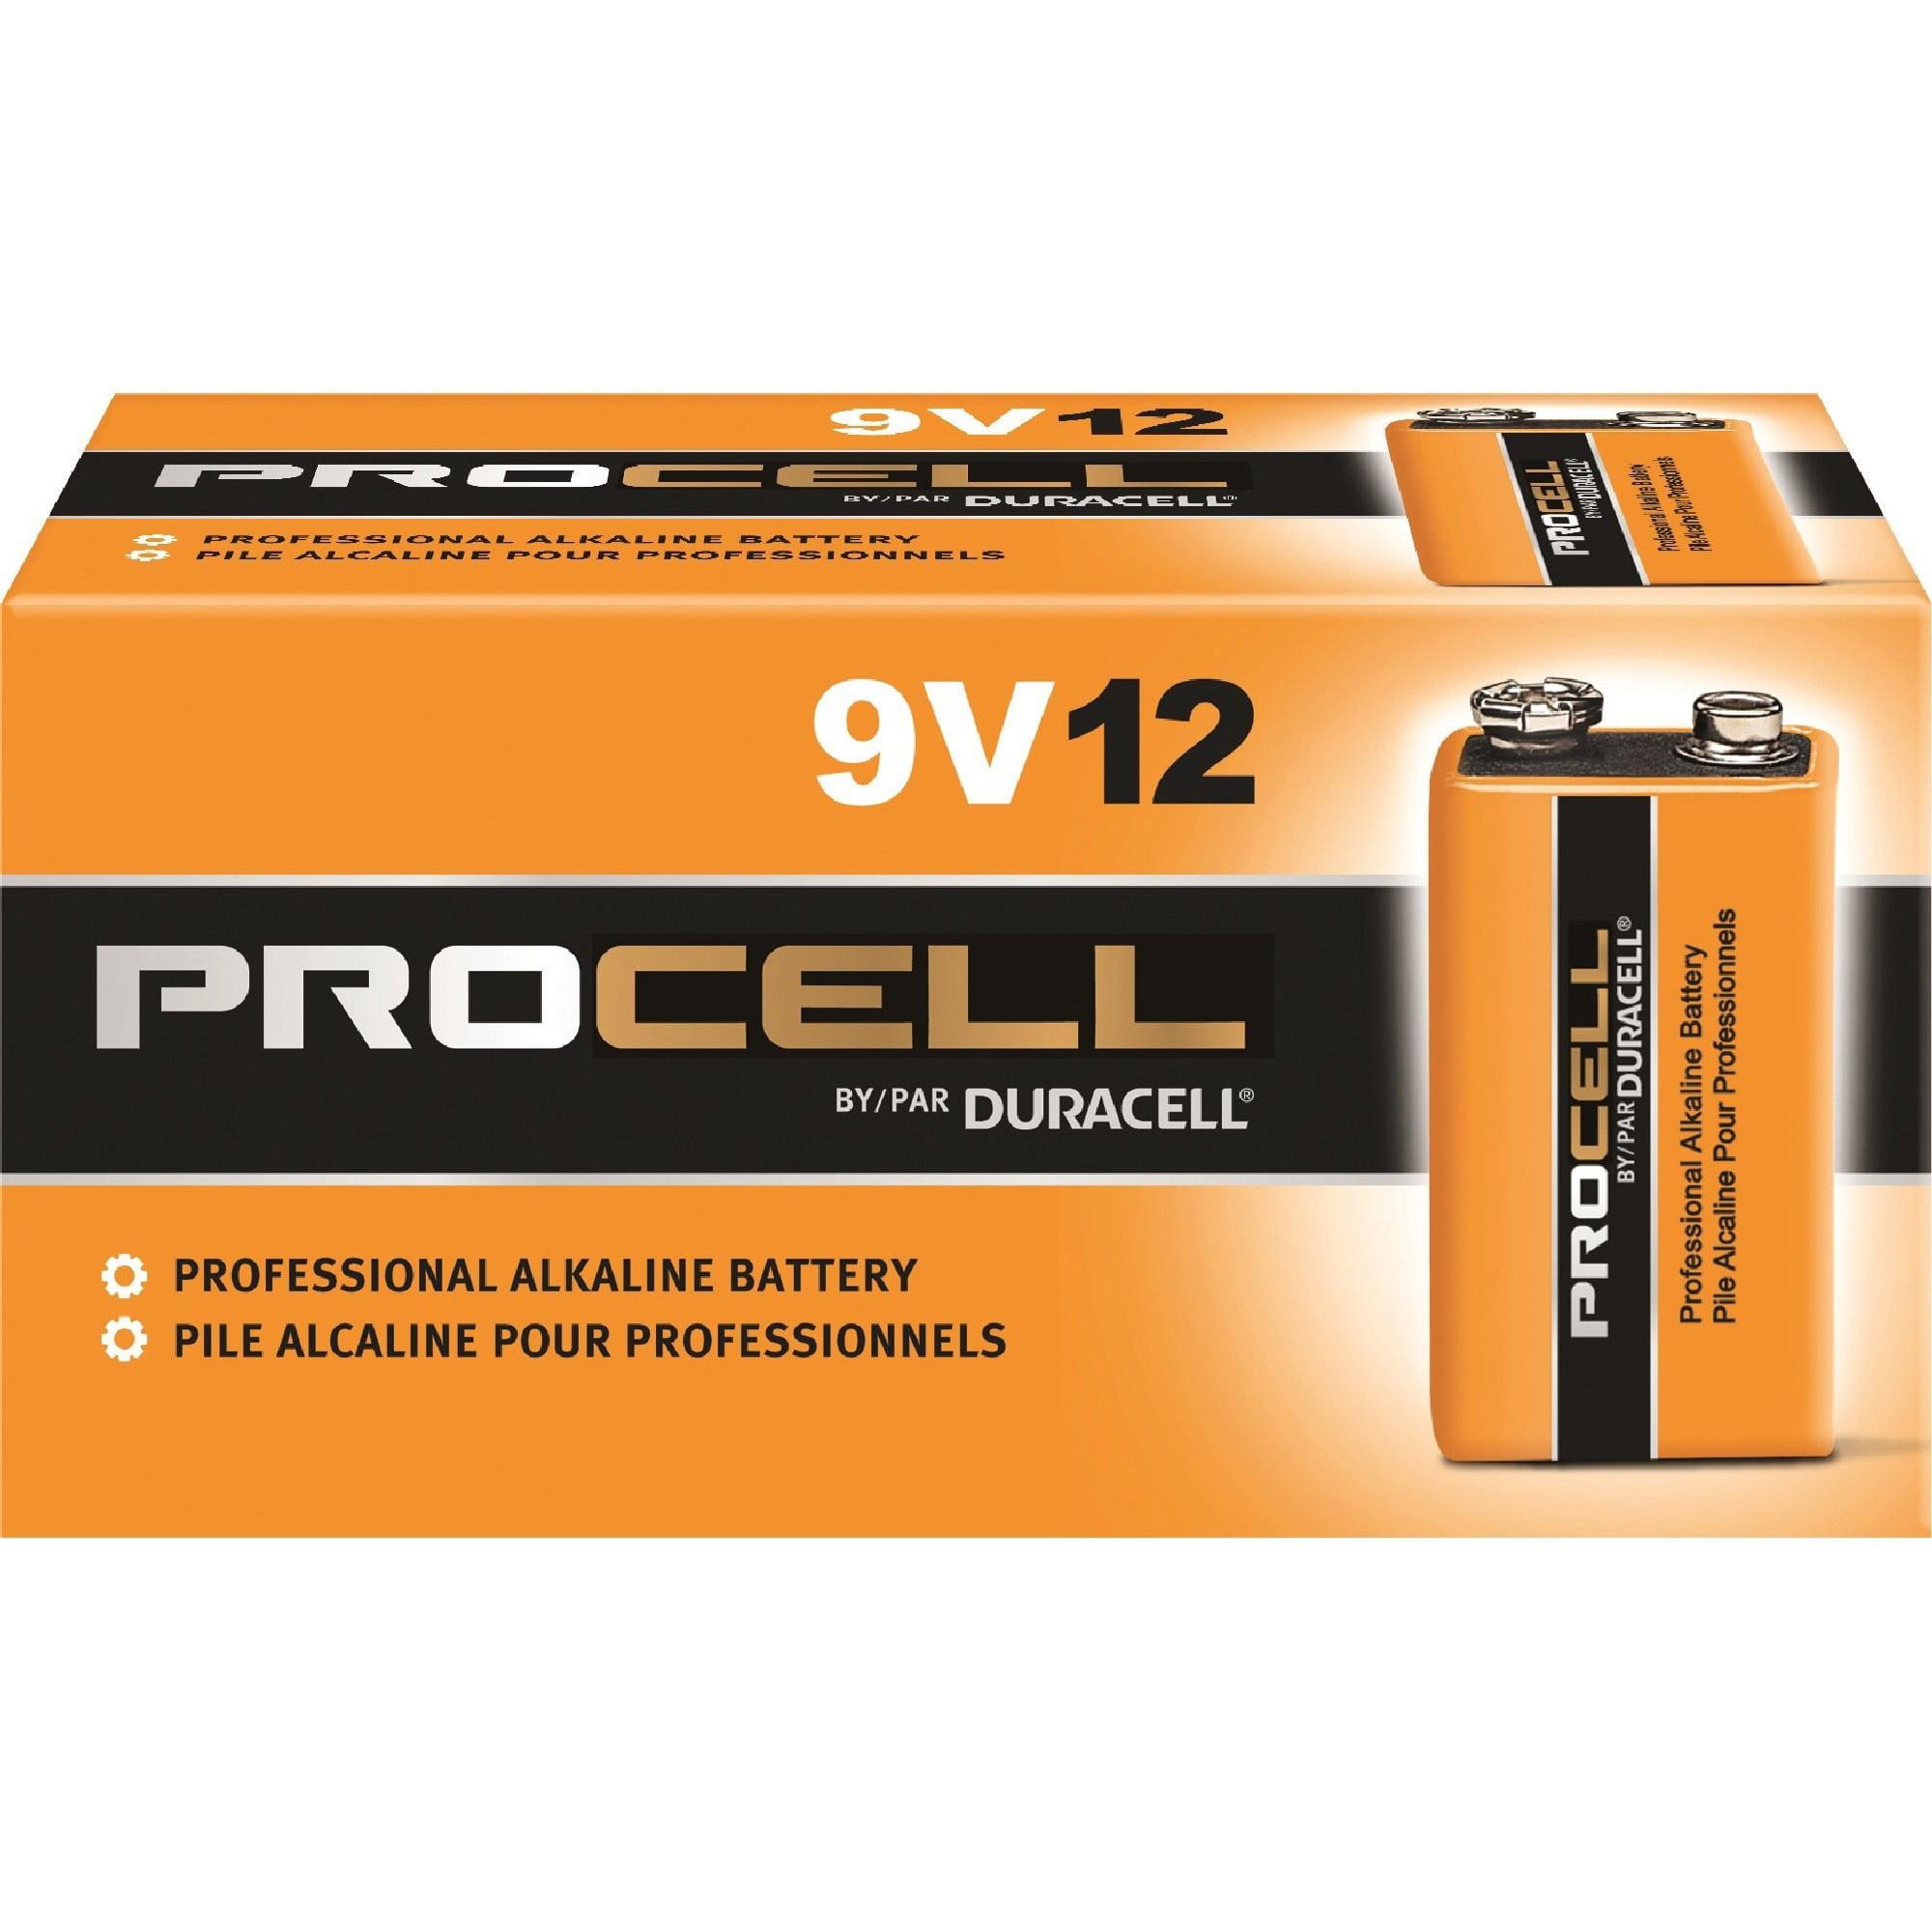 Duracell Procell Alkaline 9v Battery Pc1604 12 Box Quantity Walmart Com Walmart Com